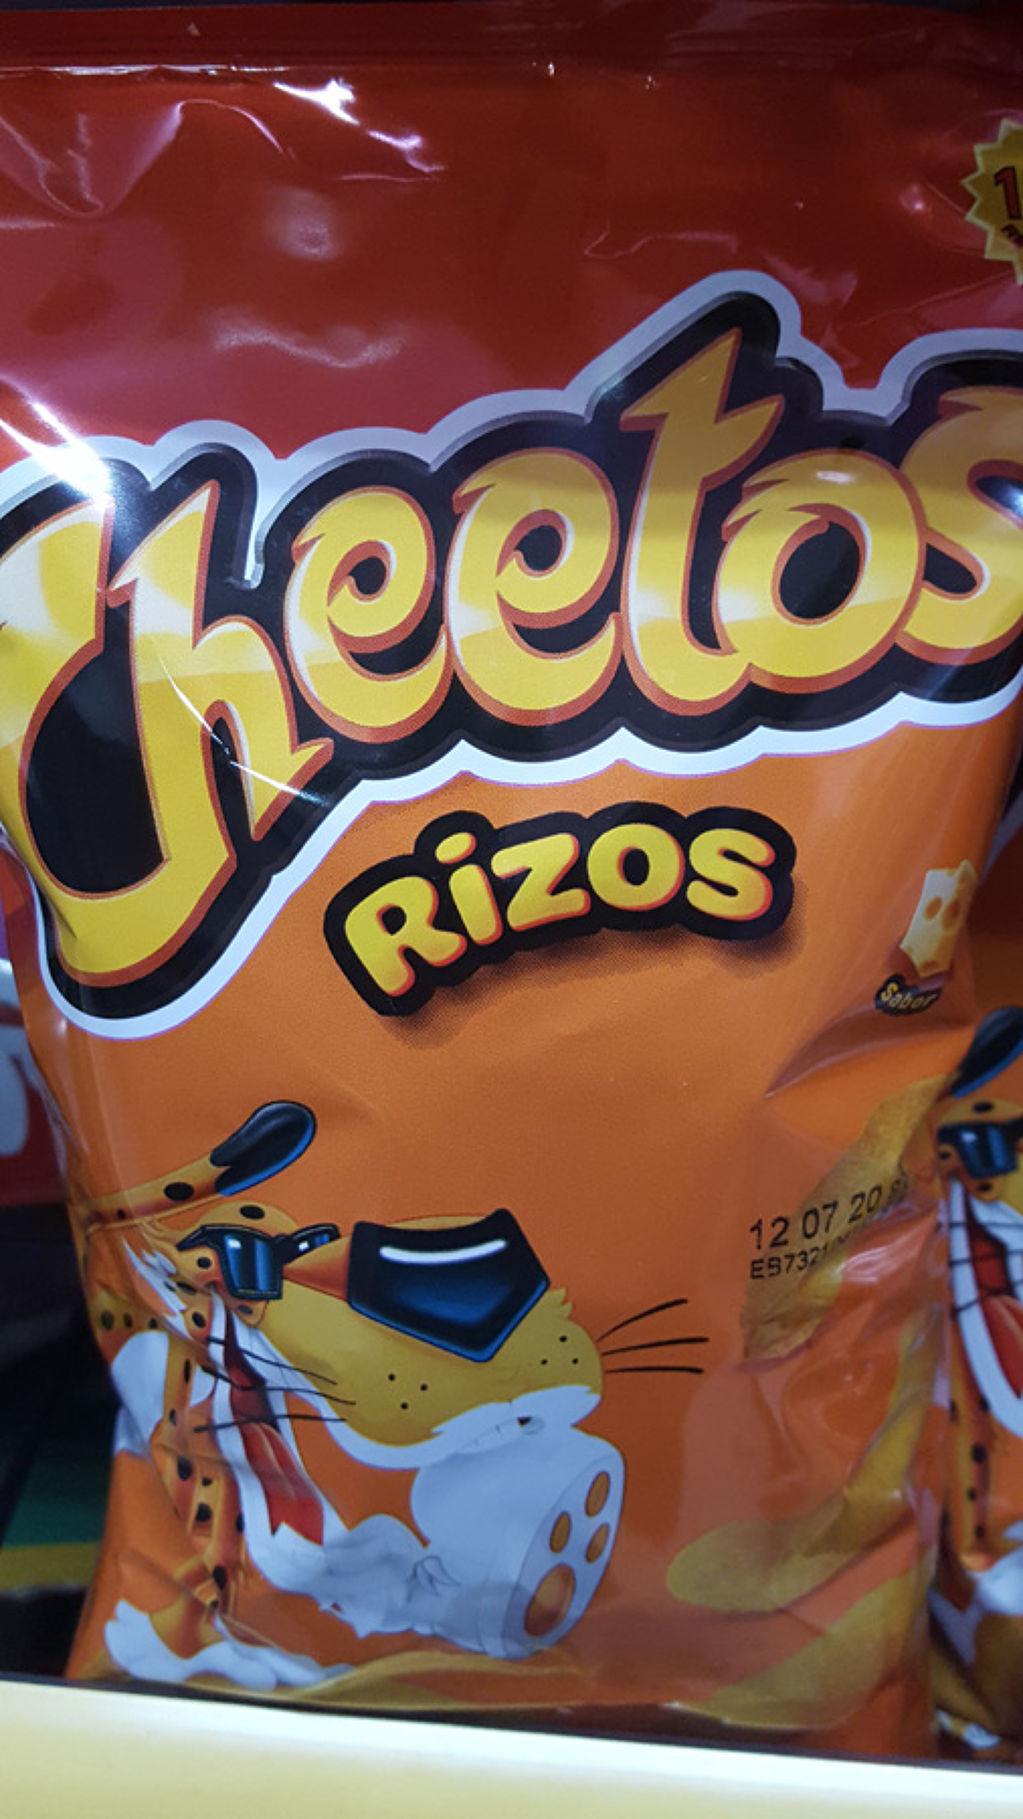 Cheetos rizos - 6b1c0-20200509_083229.jpg